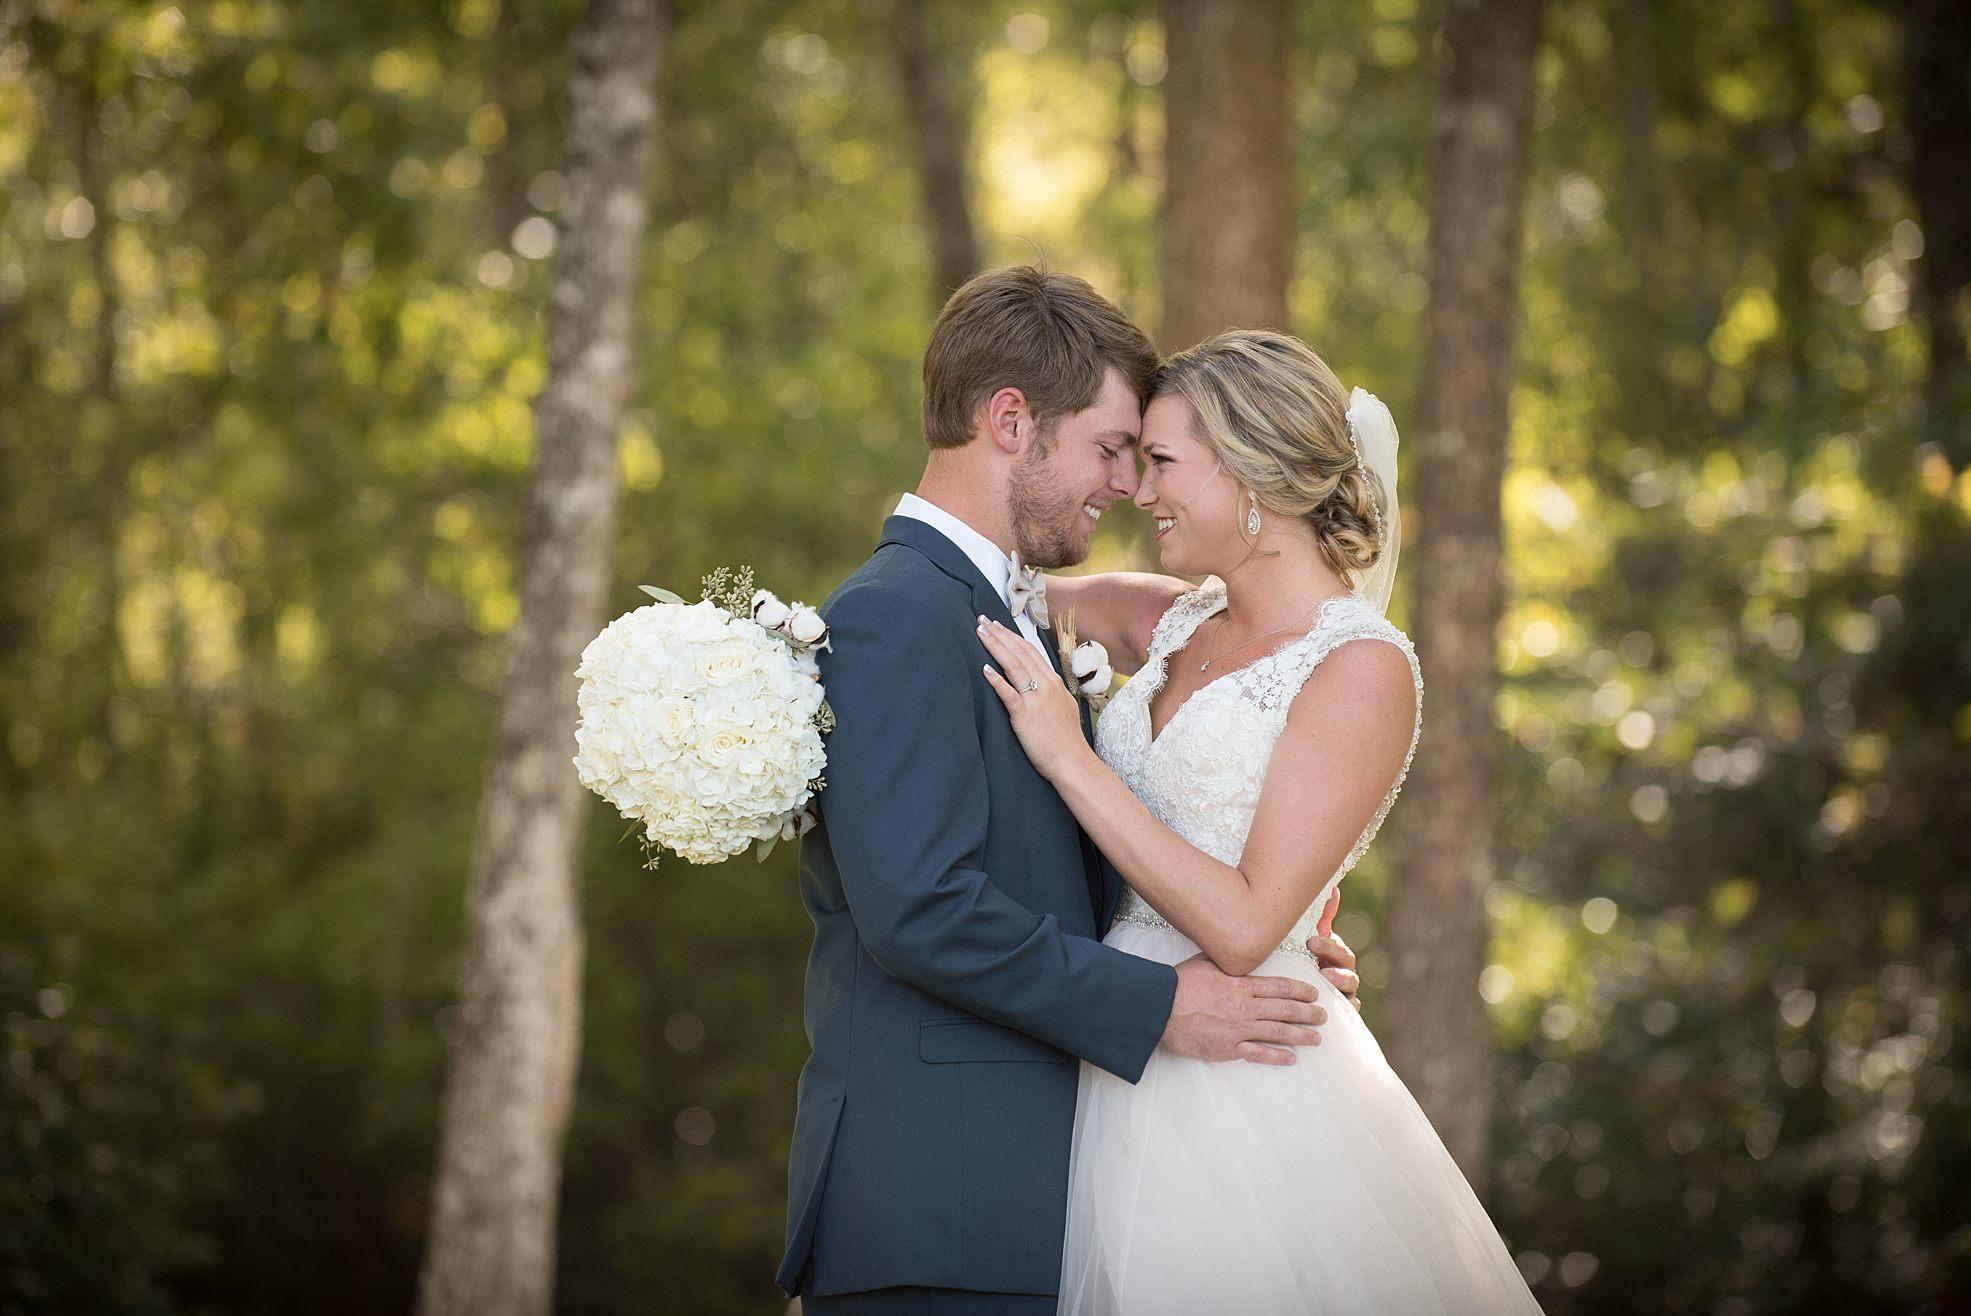 Andalusia Alabama Wedding Photographer_0101.jpg